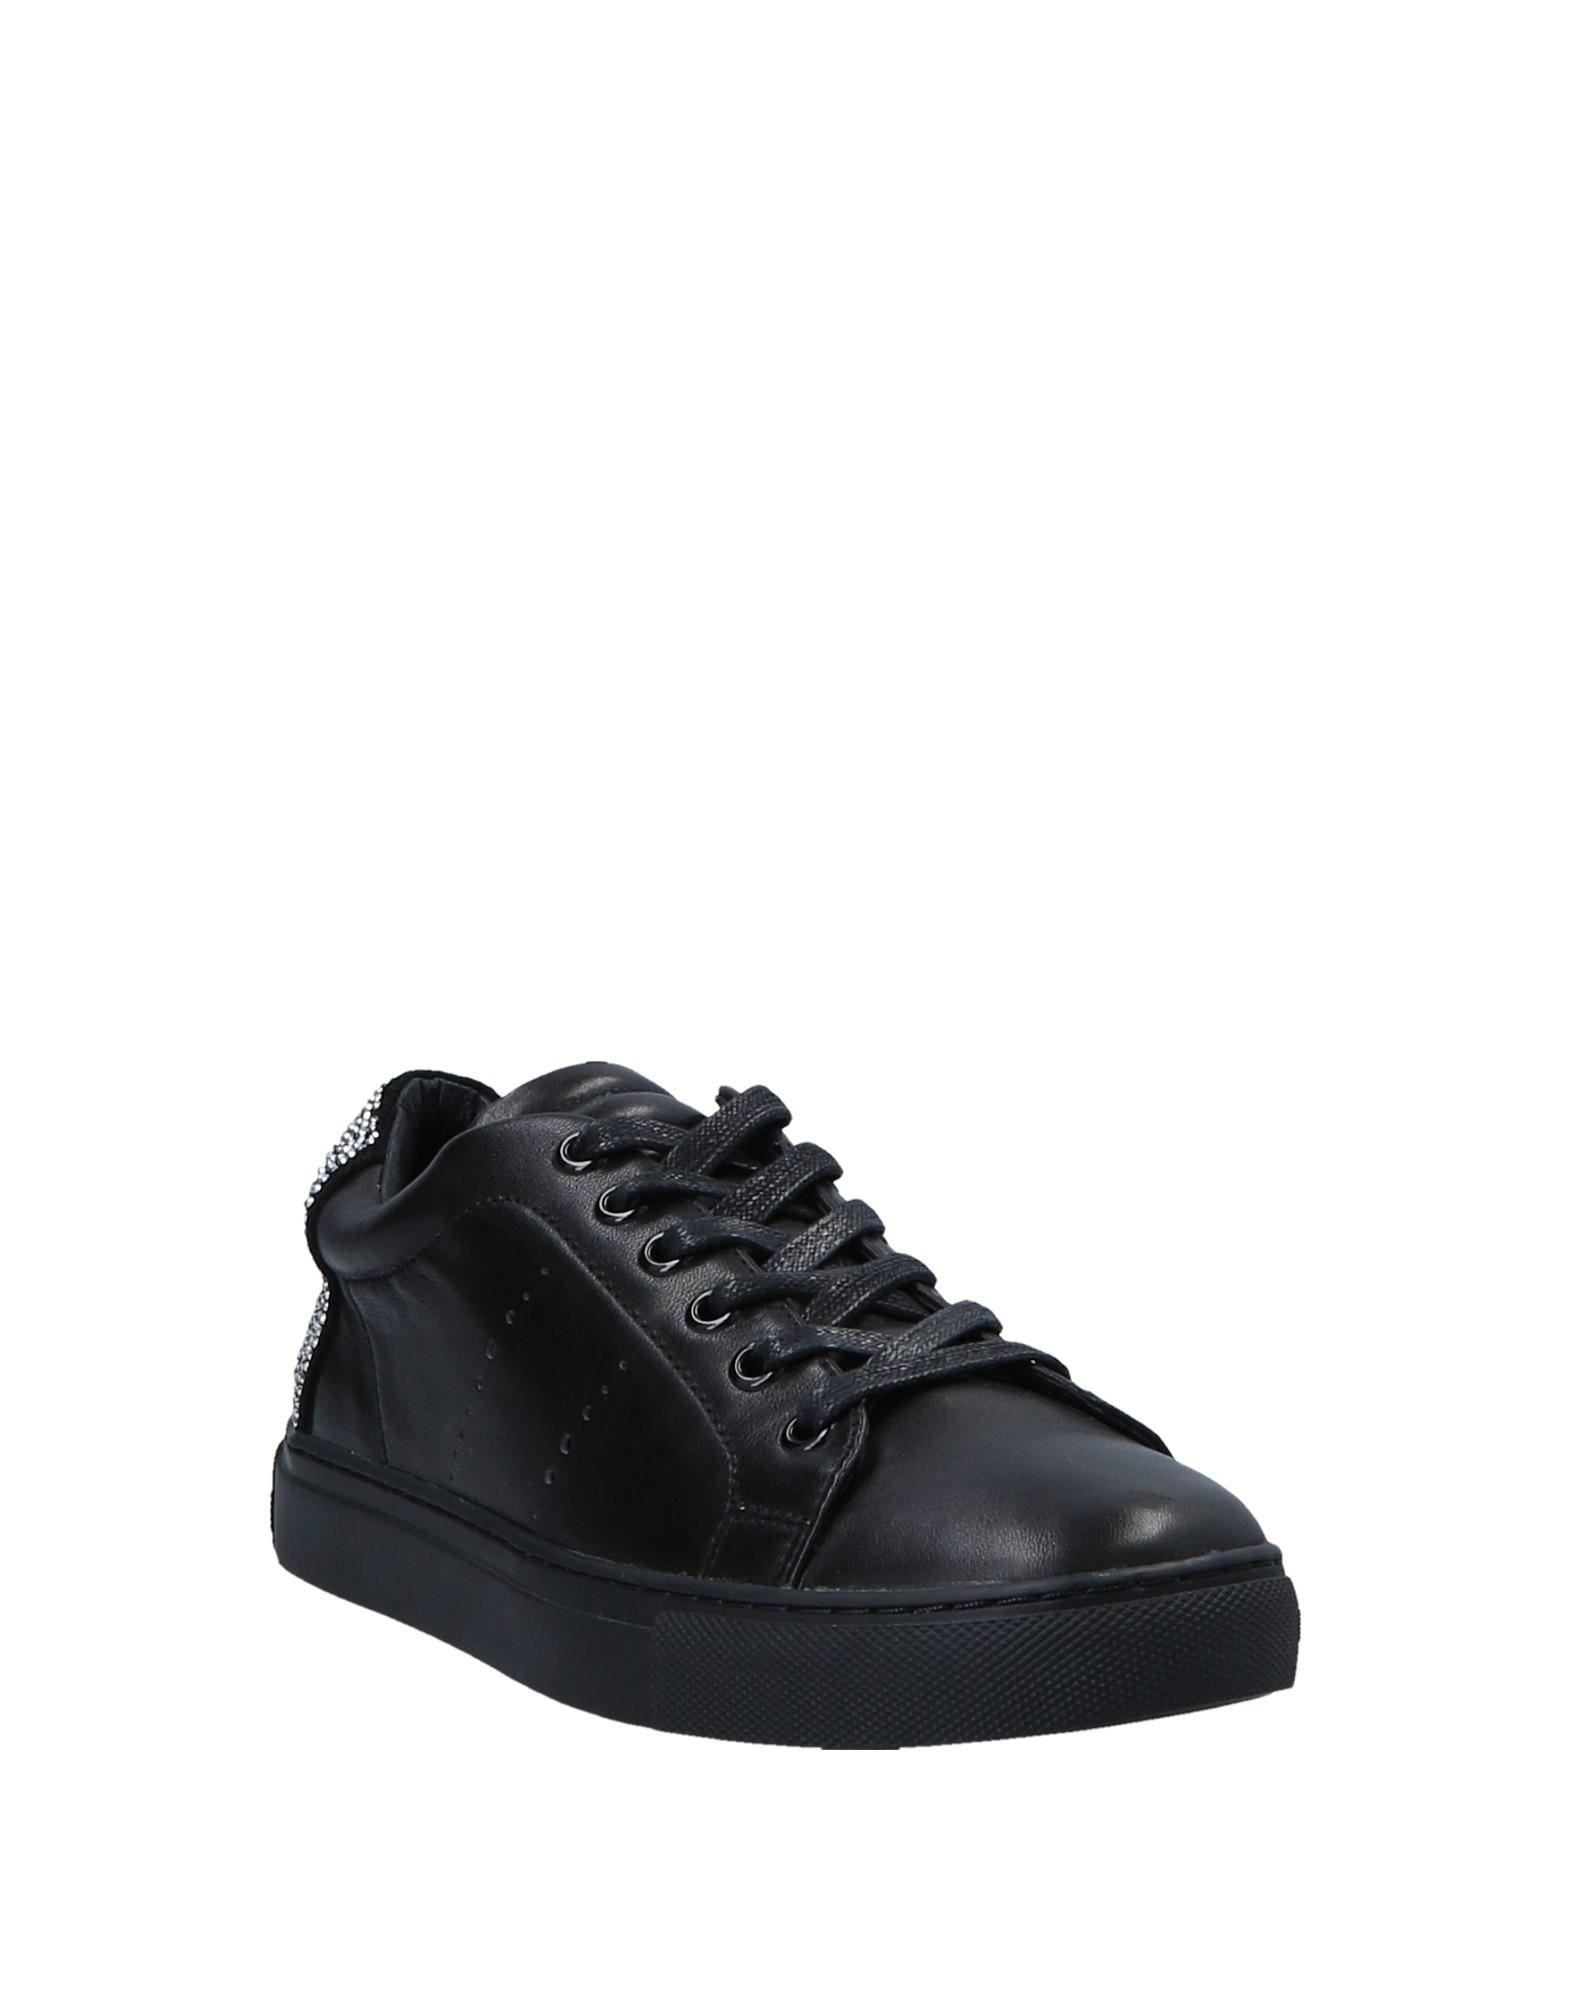 Lola 11553392BA Cruz Sneakers Damen  11553392BA Lola fe918f